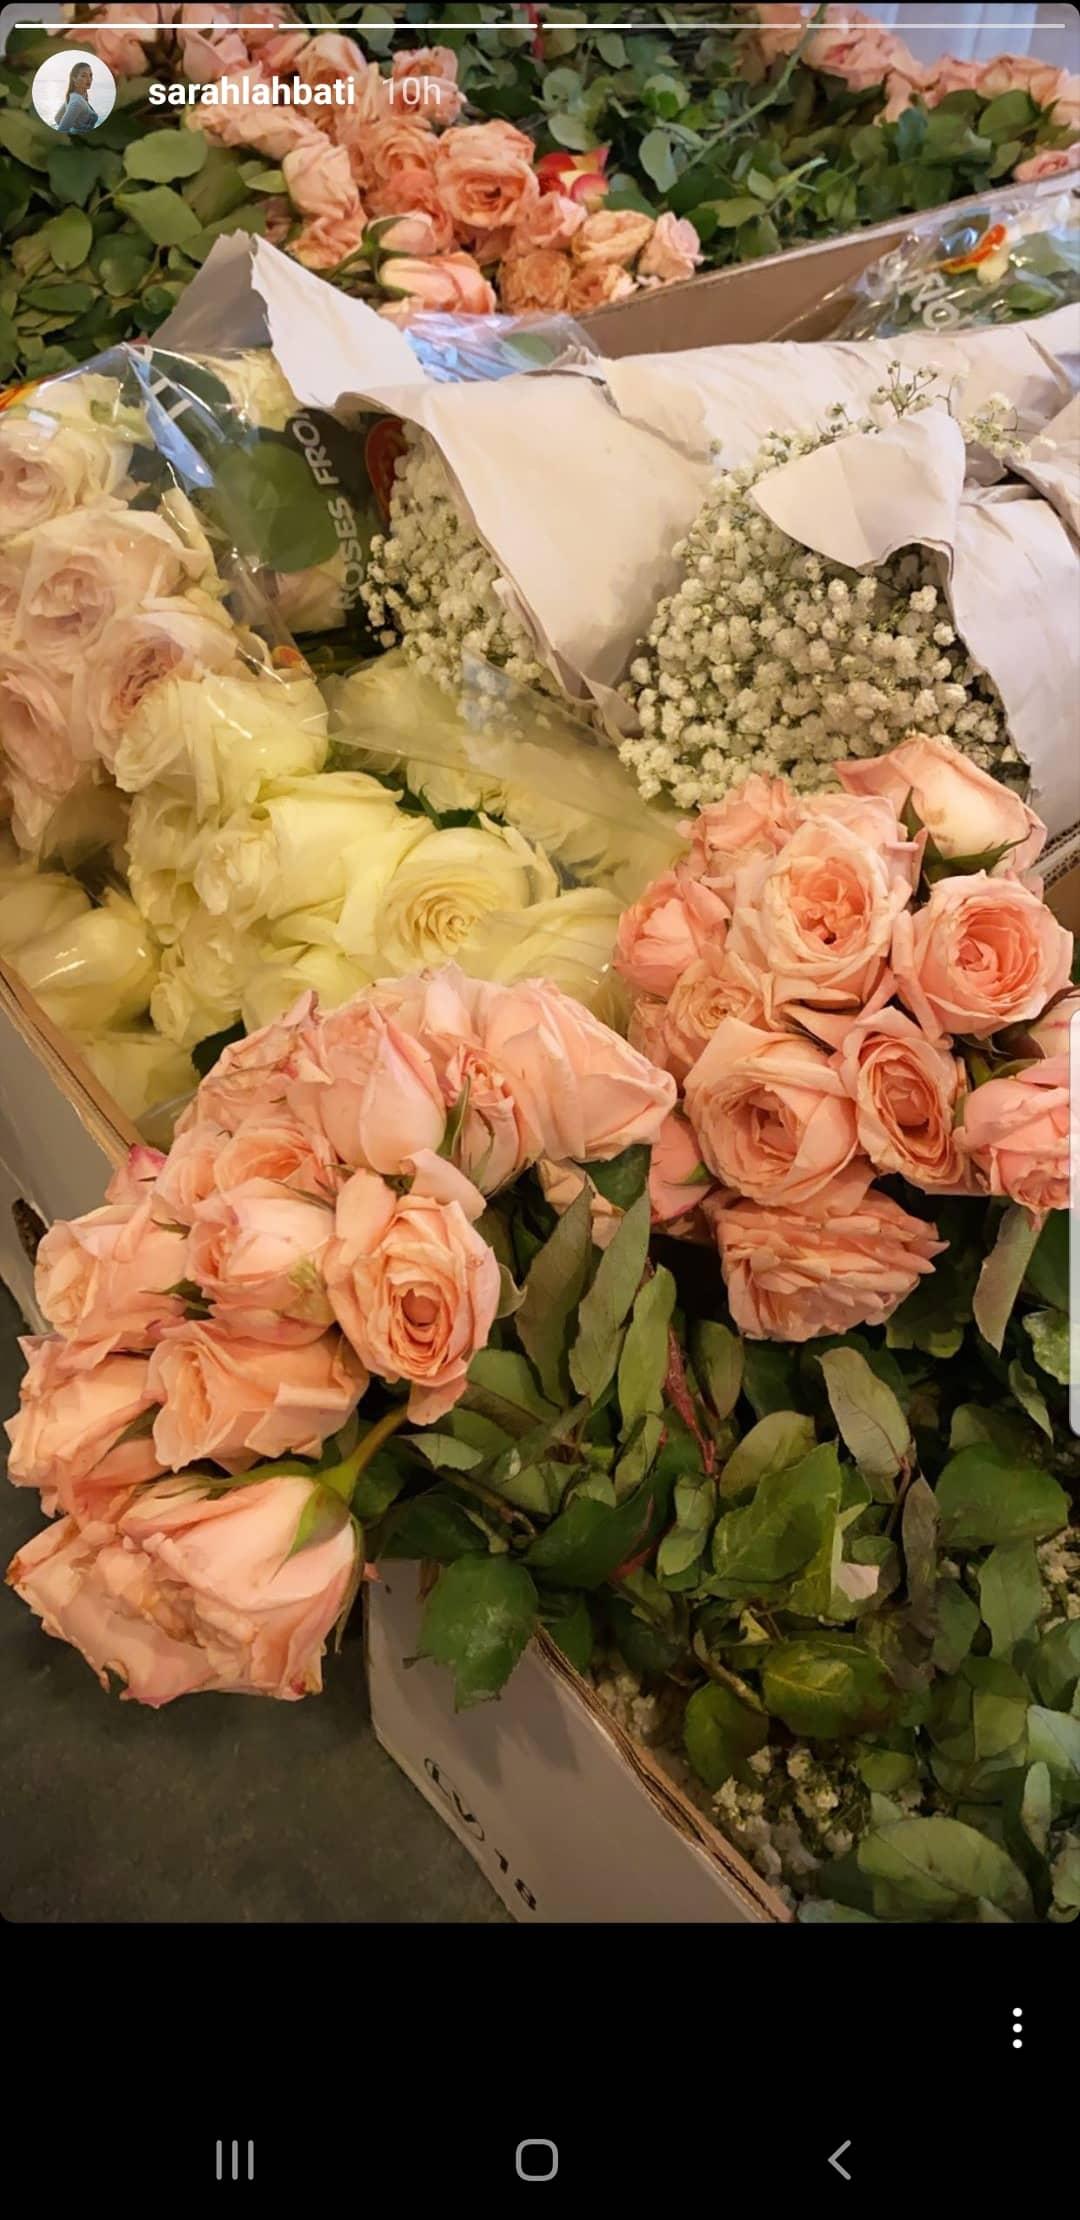 sarah lahbati richard gutierrez wedding flowers 1